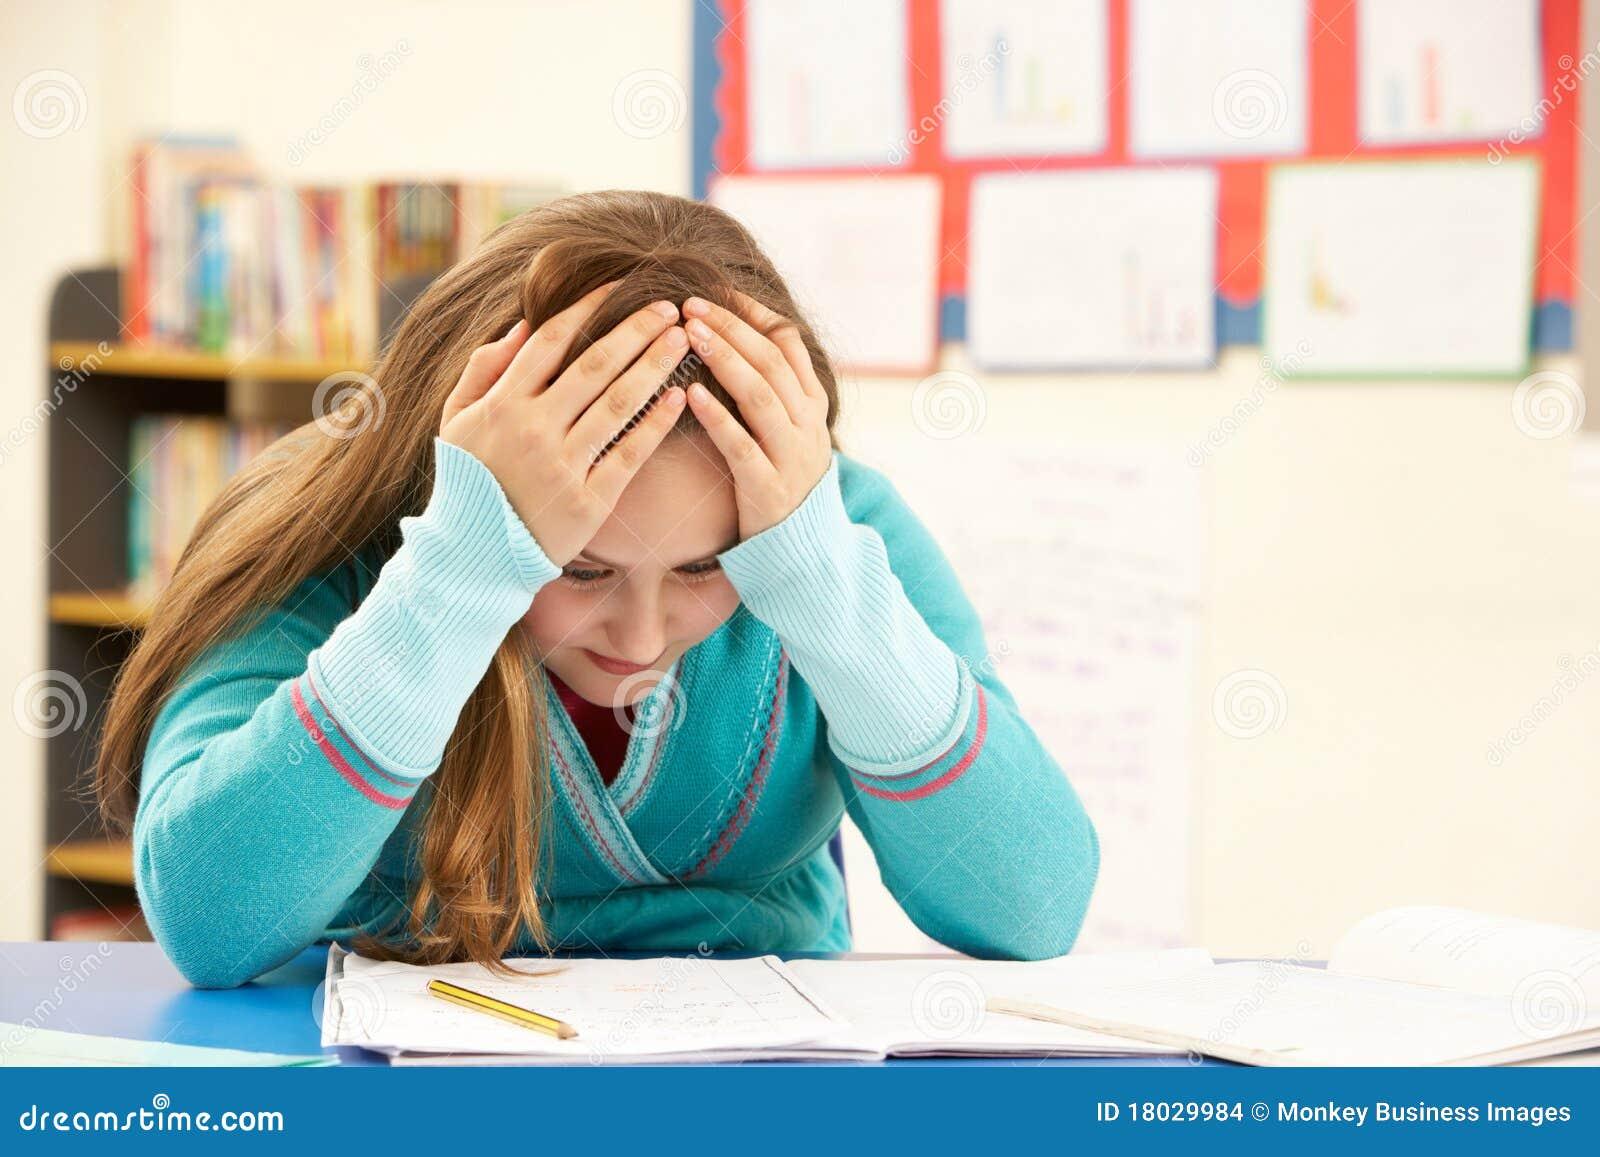 Stressed Schoolgirl Studying In Classroom